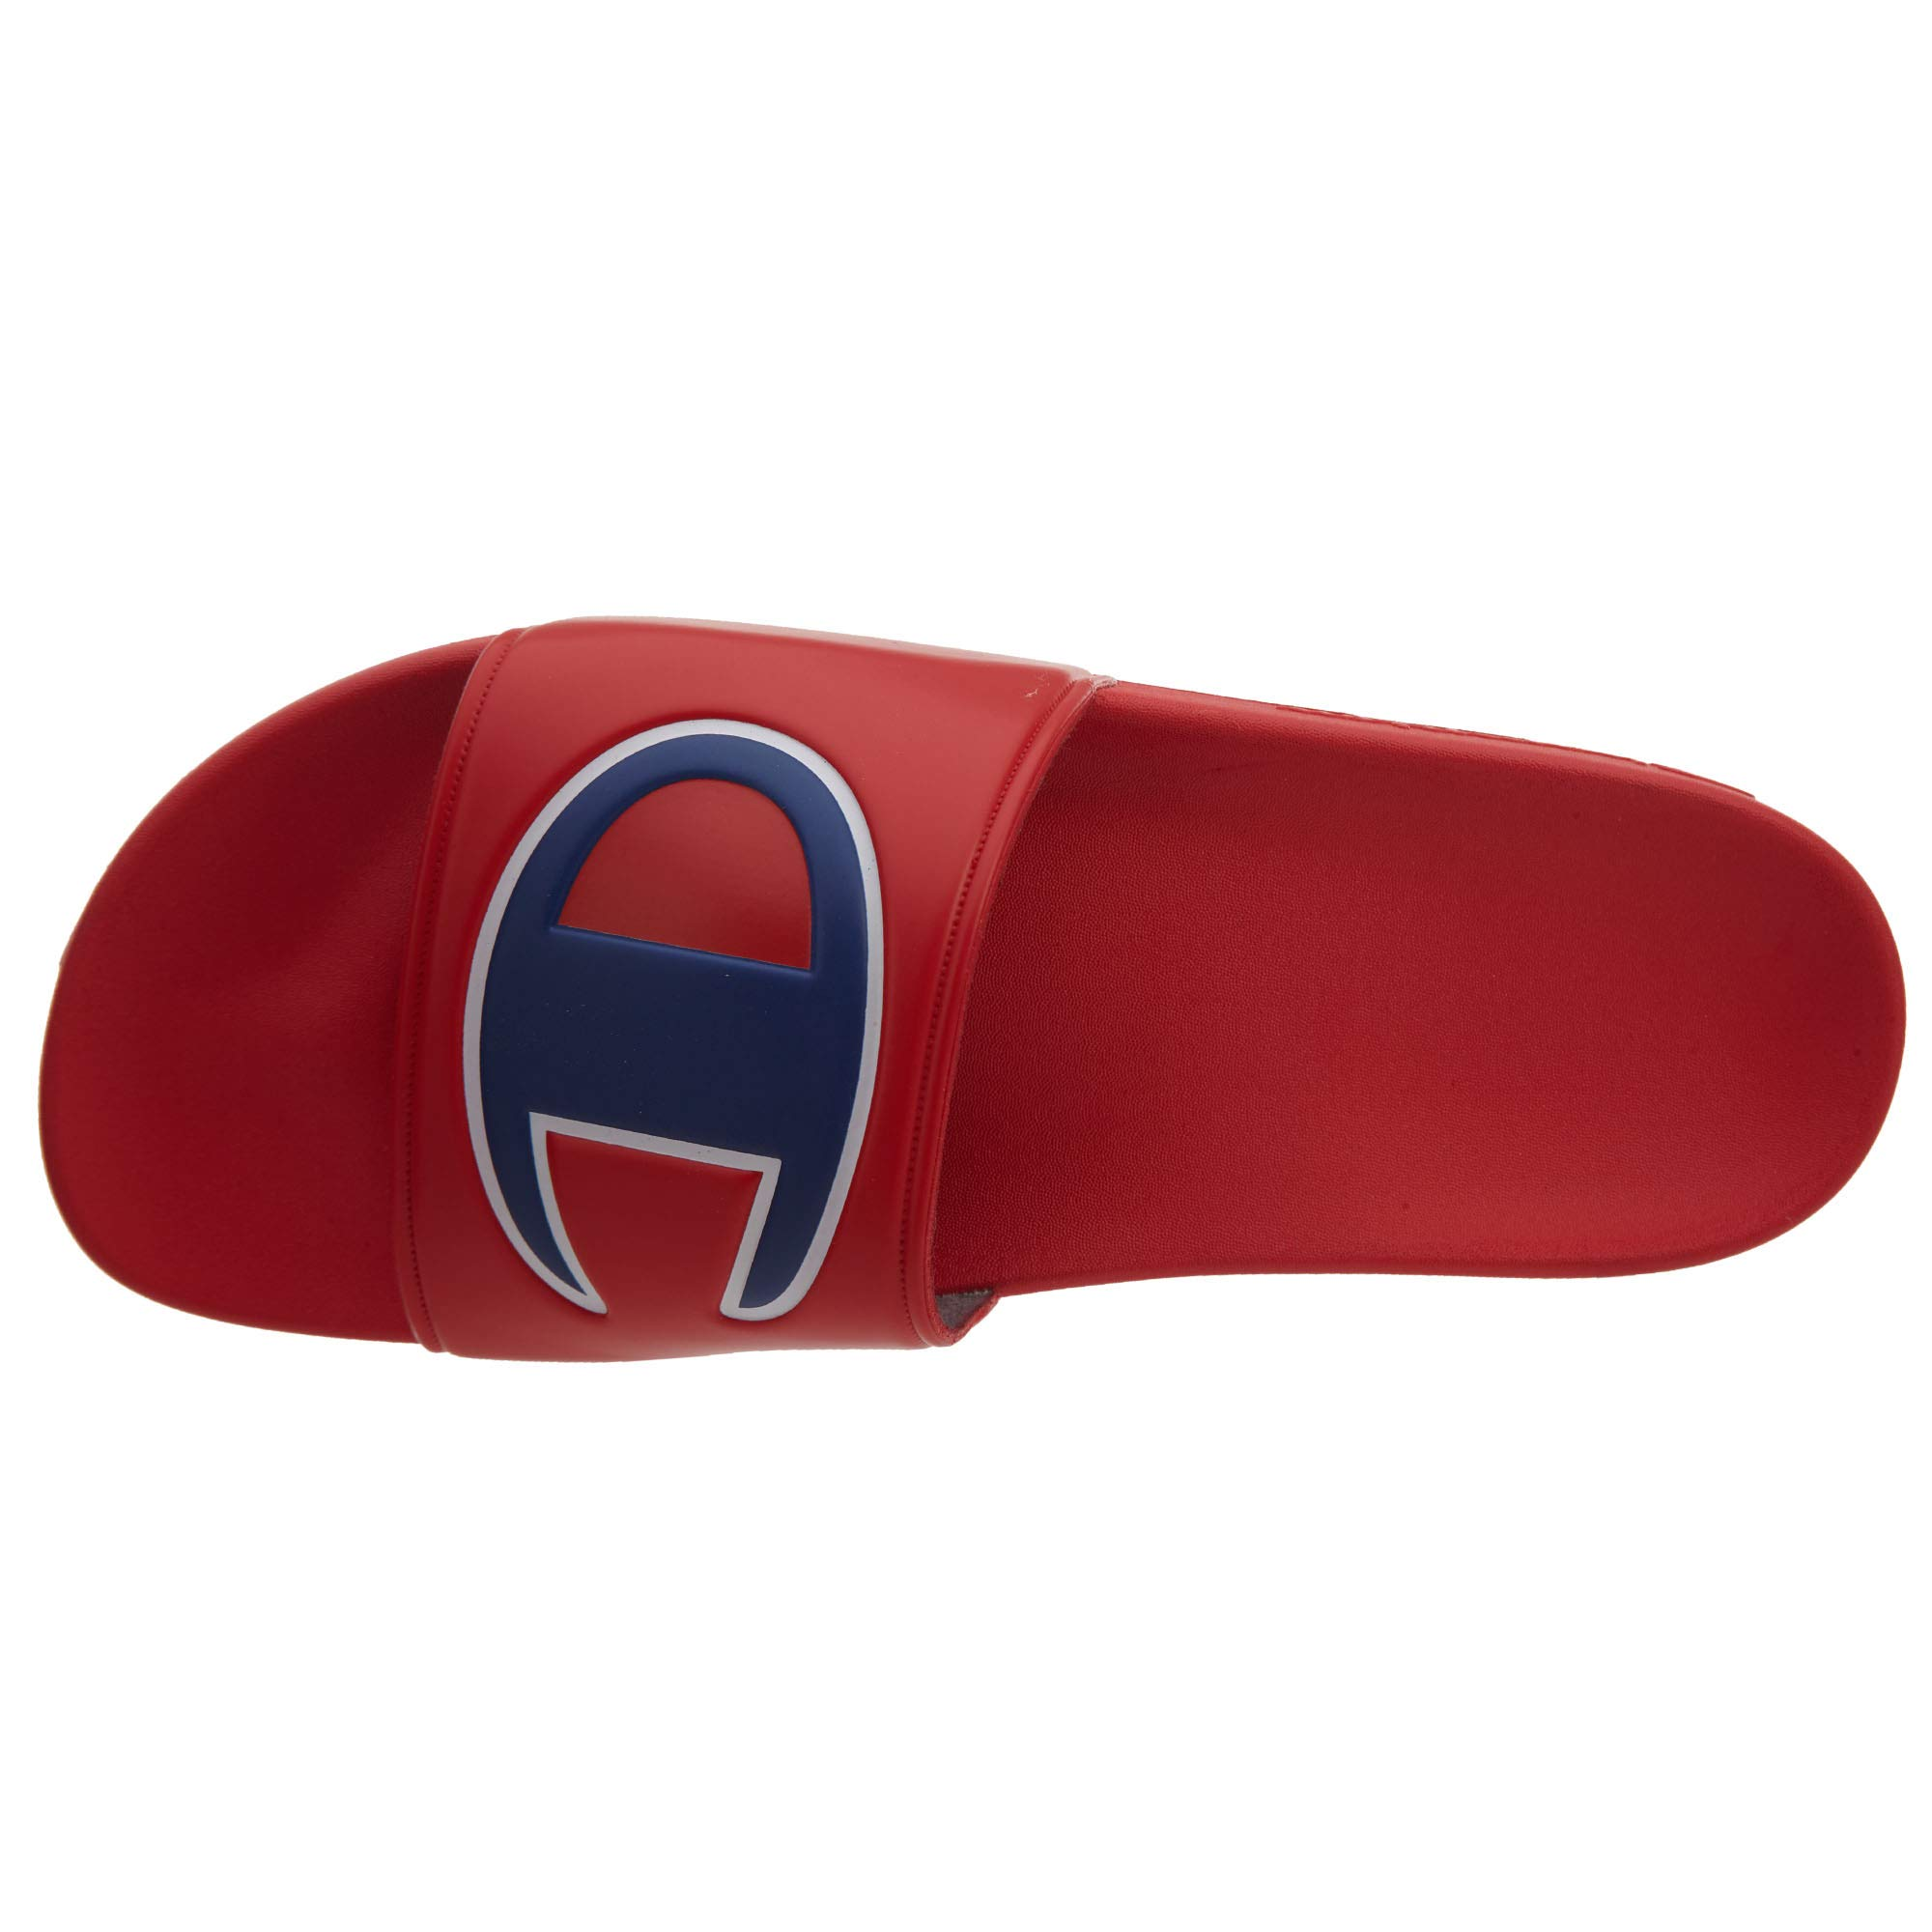 e00076c0808 Champion Men s Ipo Slide Sandal (9